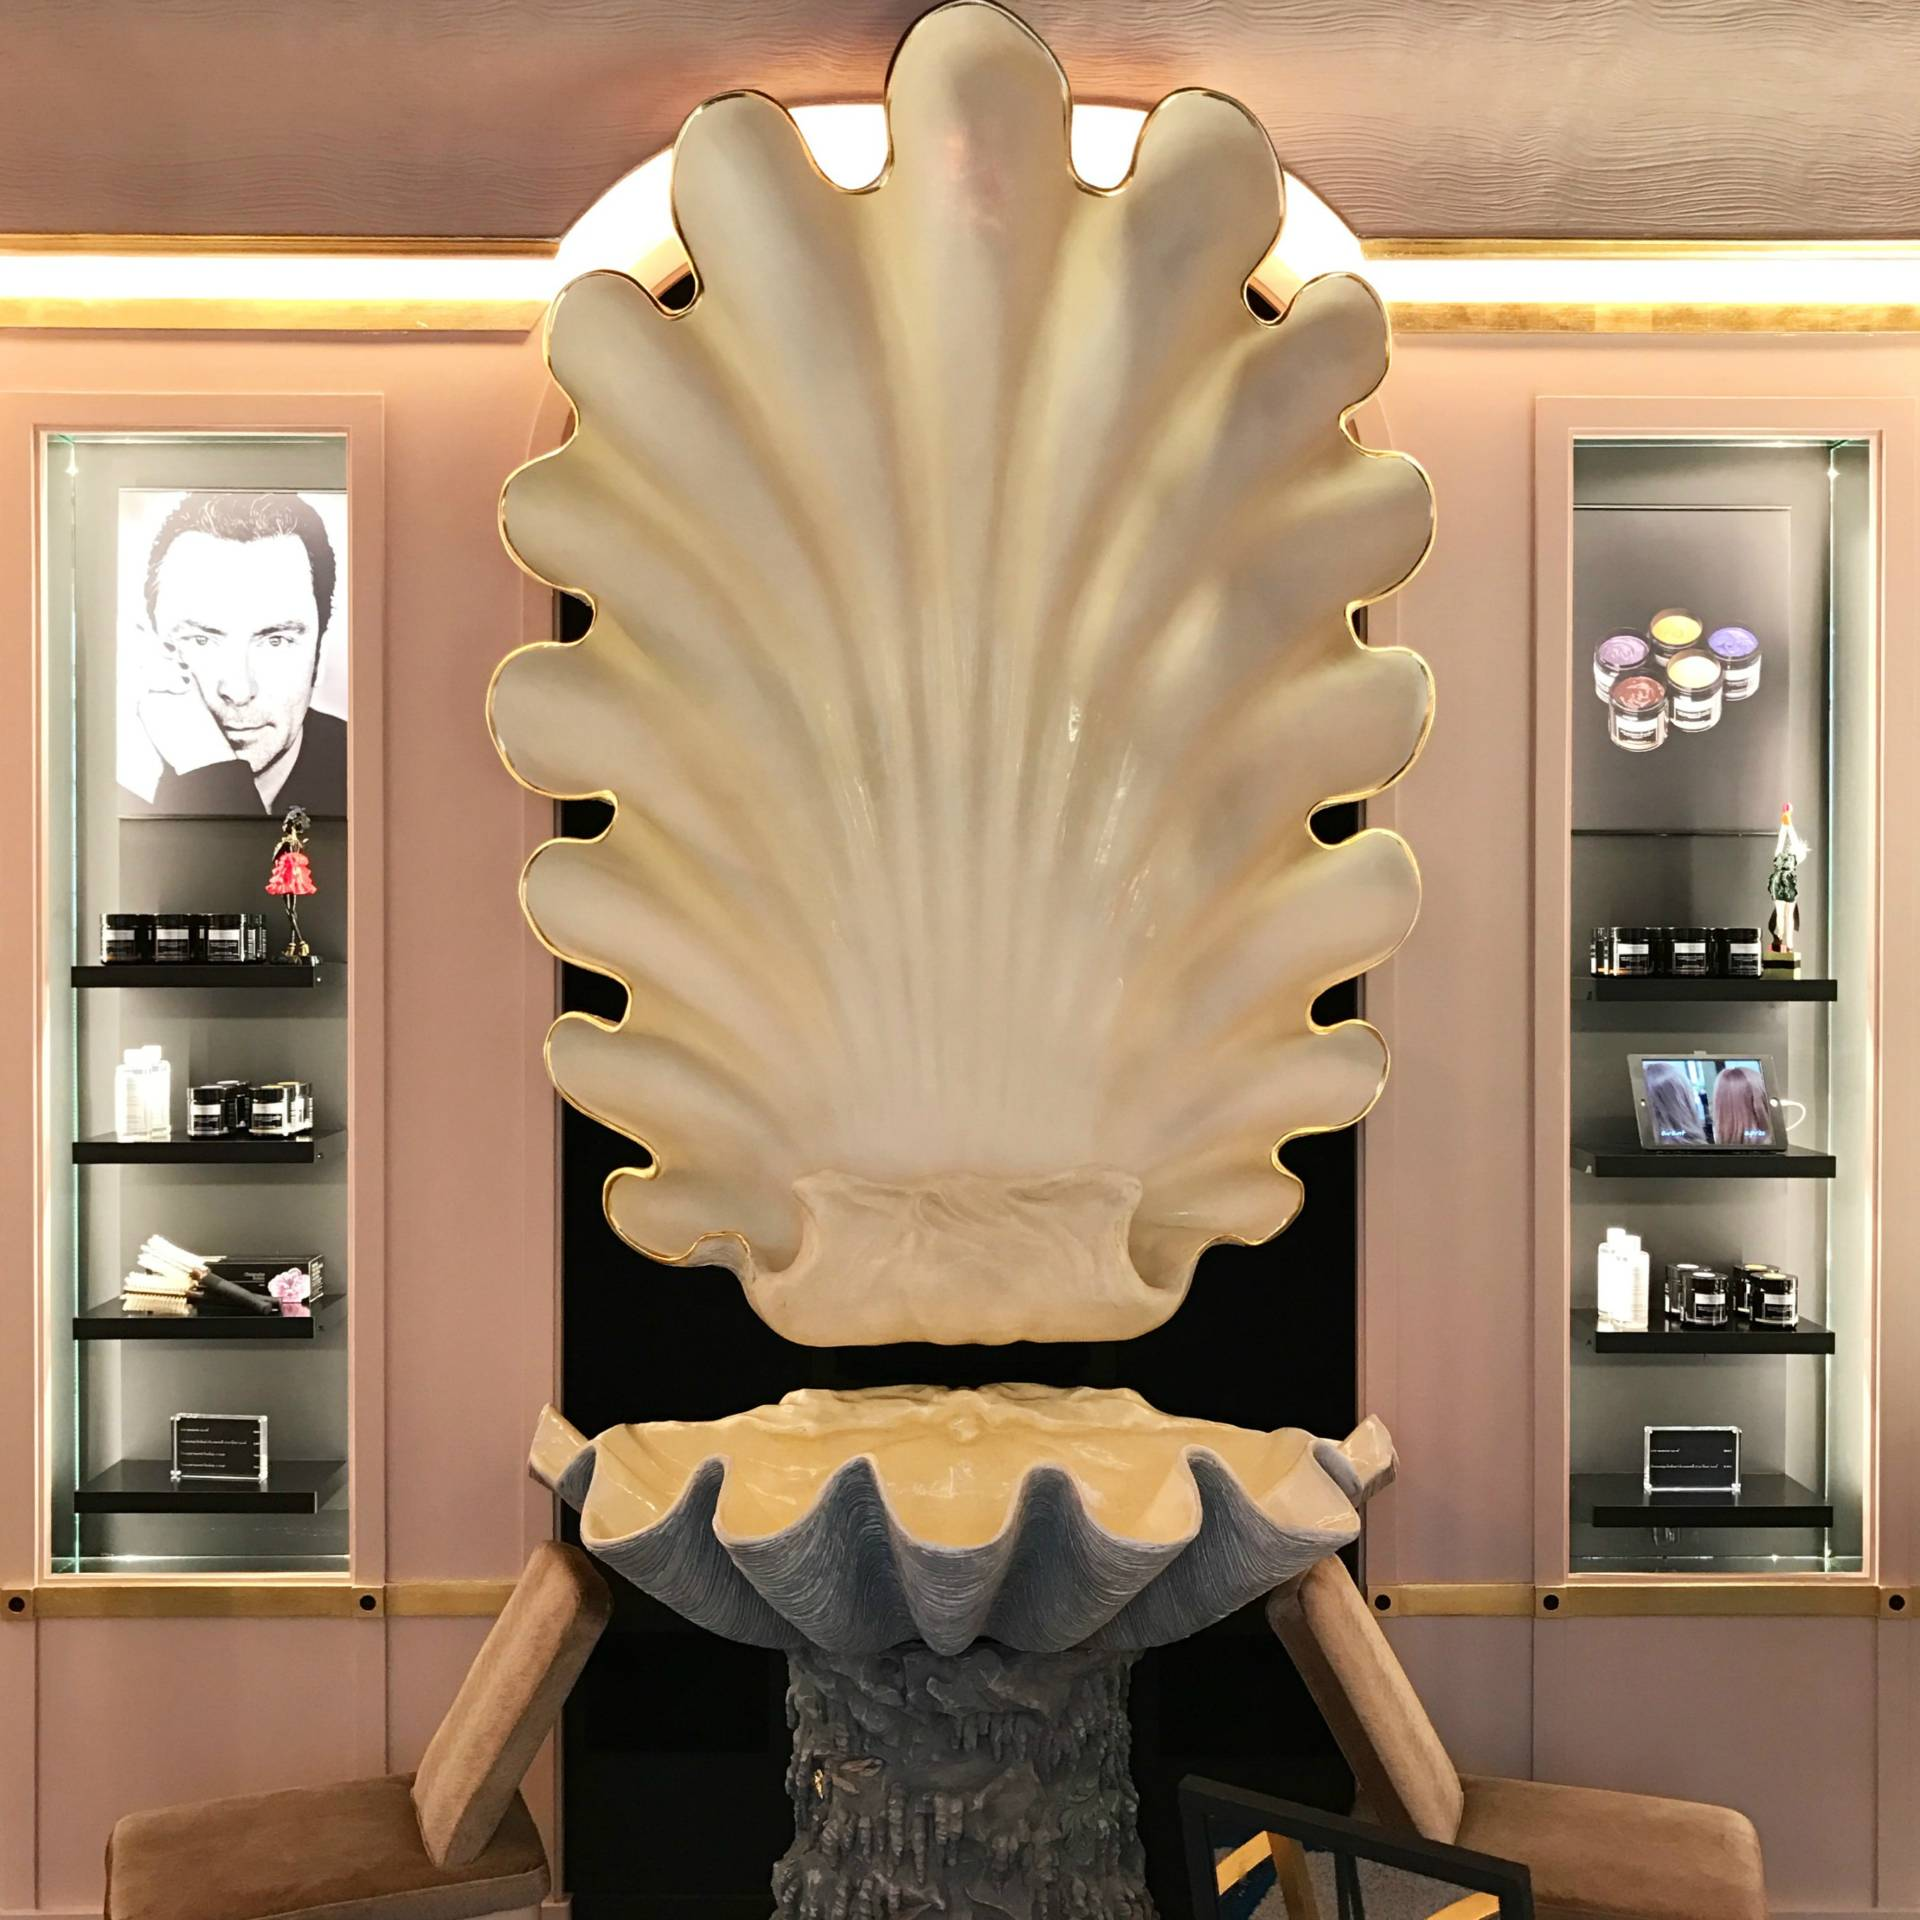 christophe-robin-salon-paris-sink-inhautepursuit